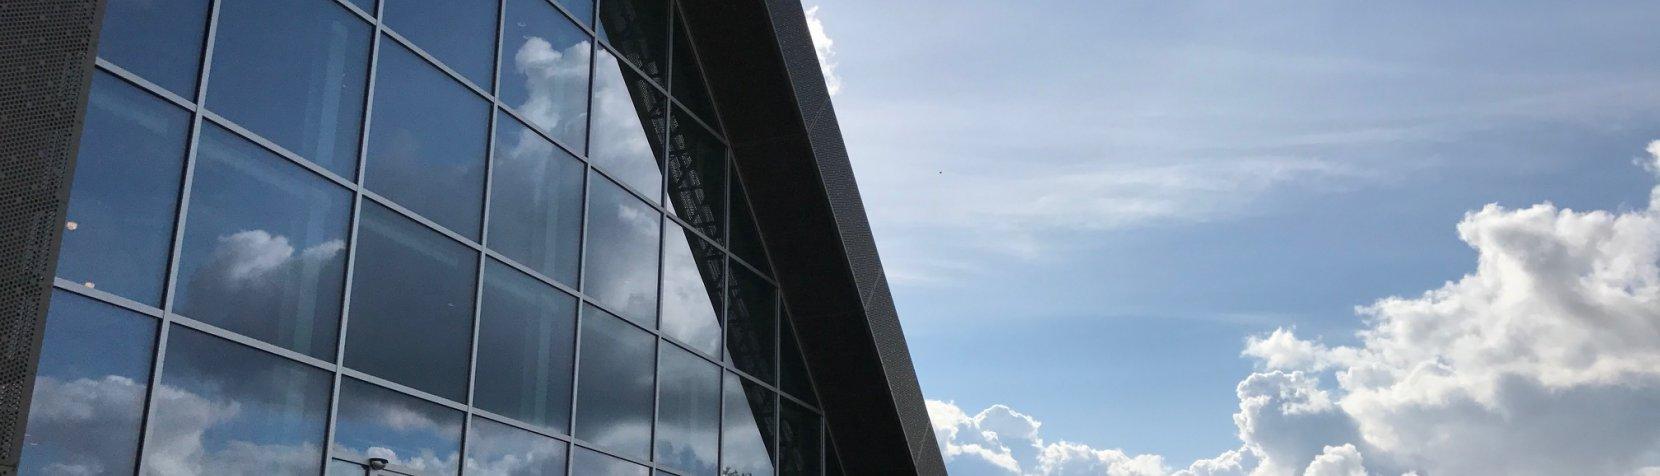 Facade med skyer